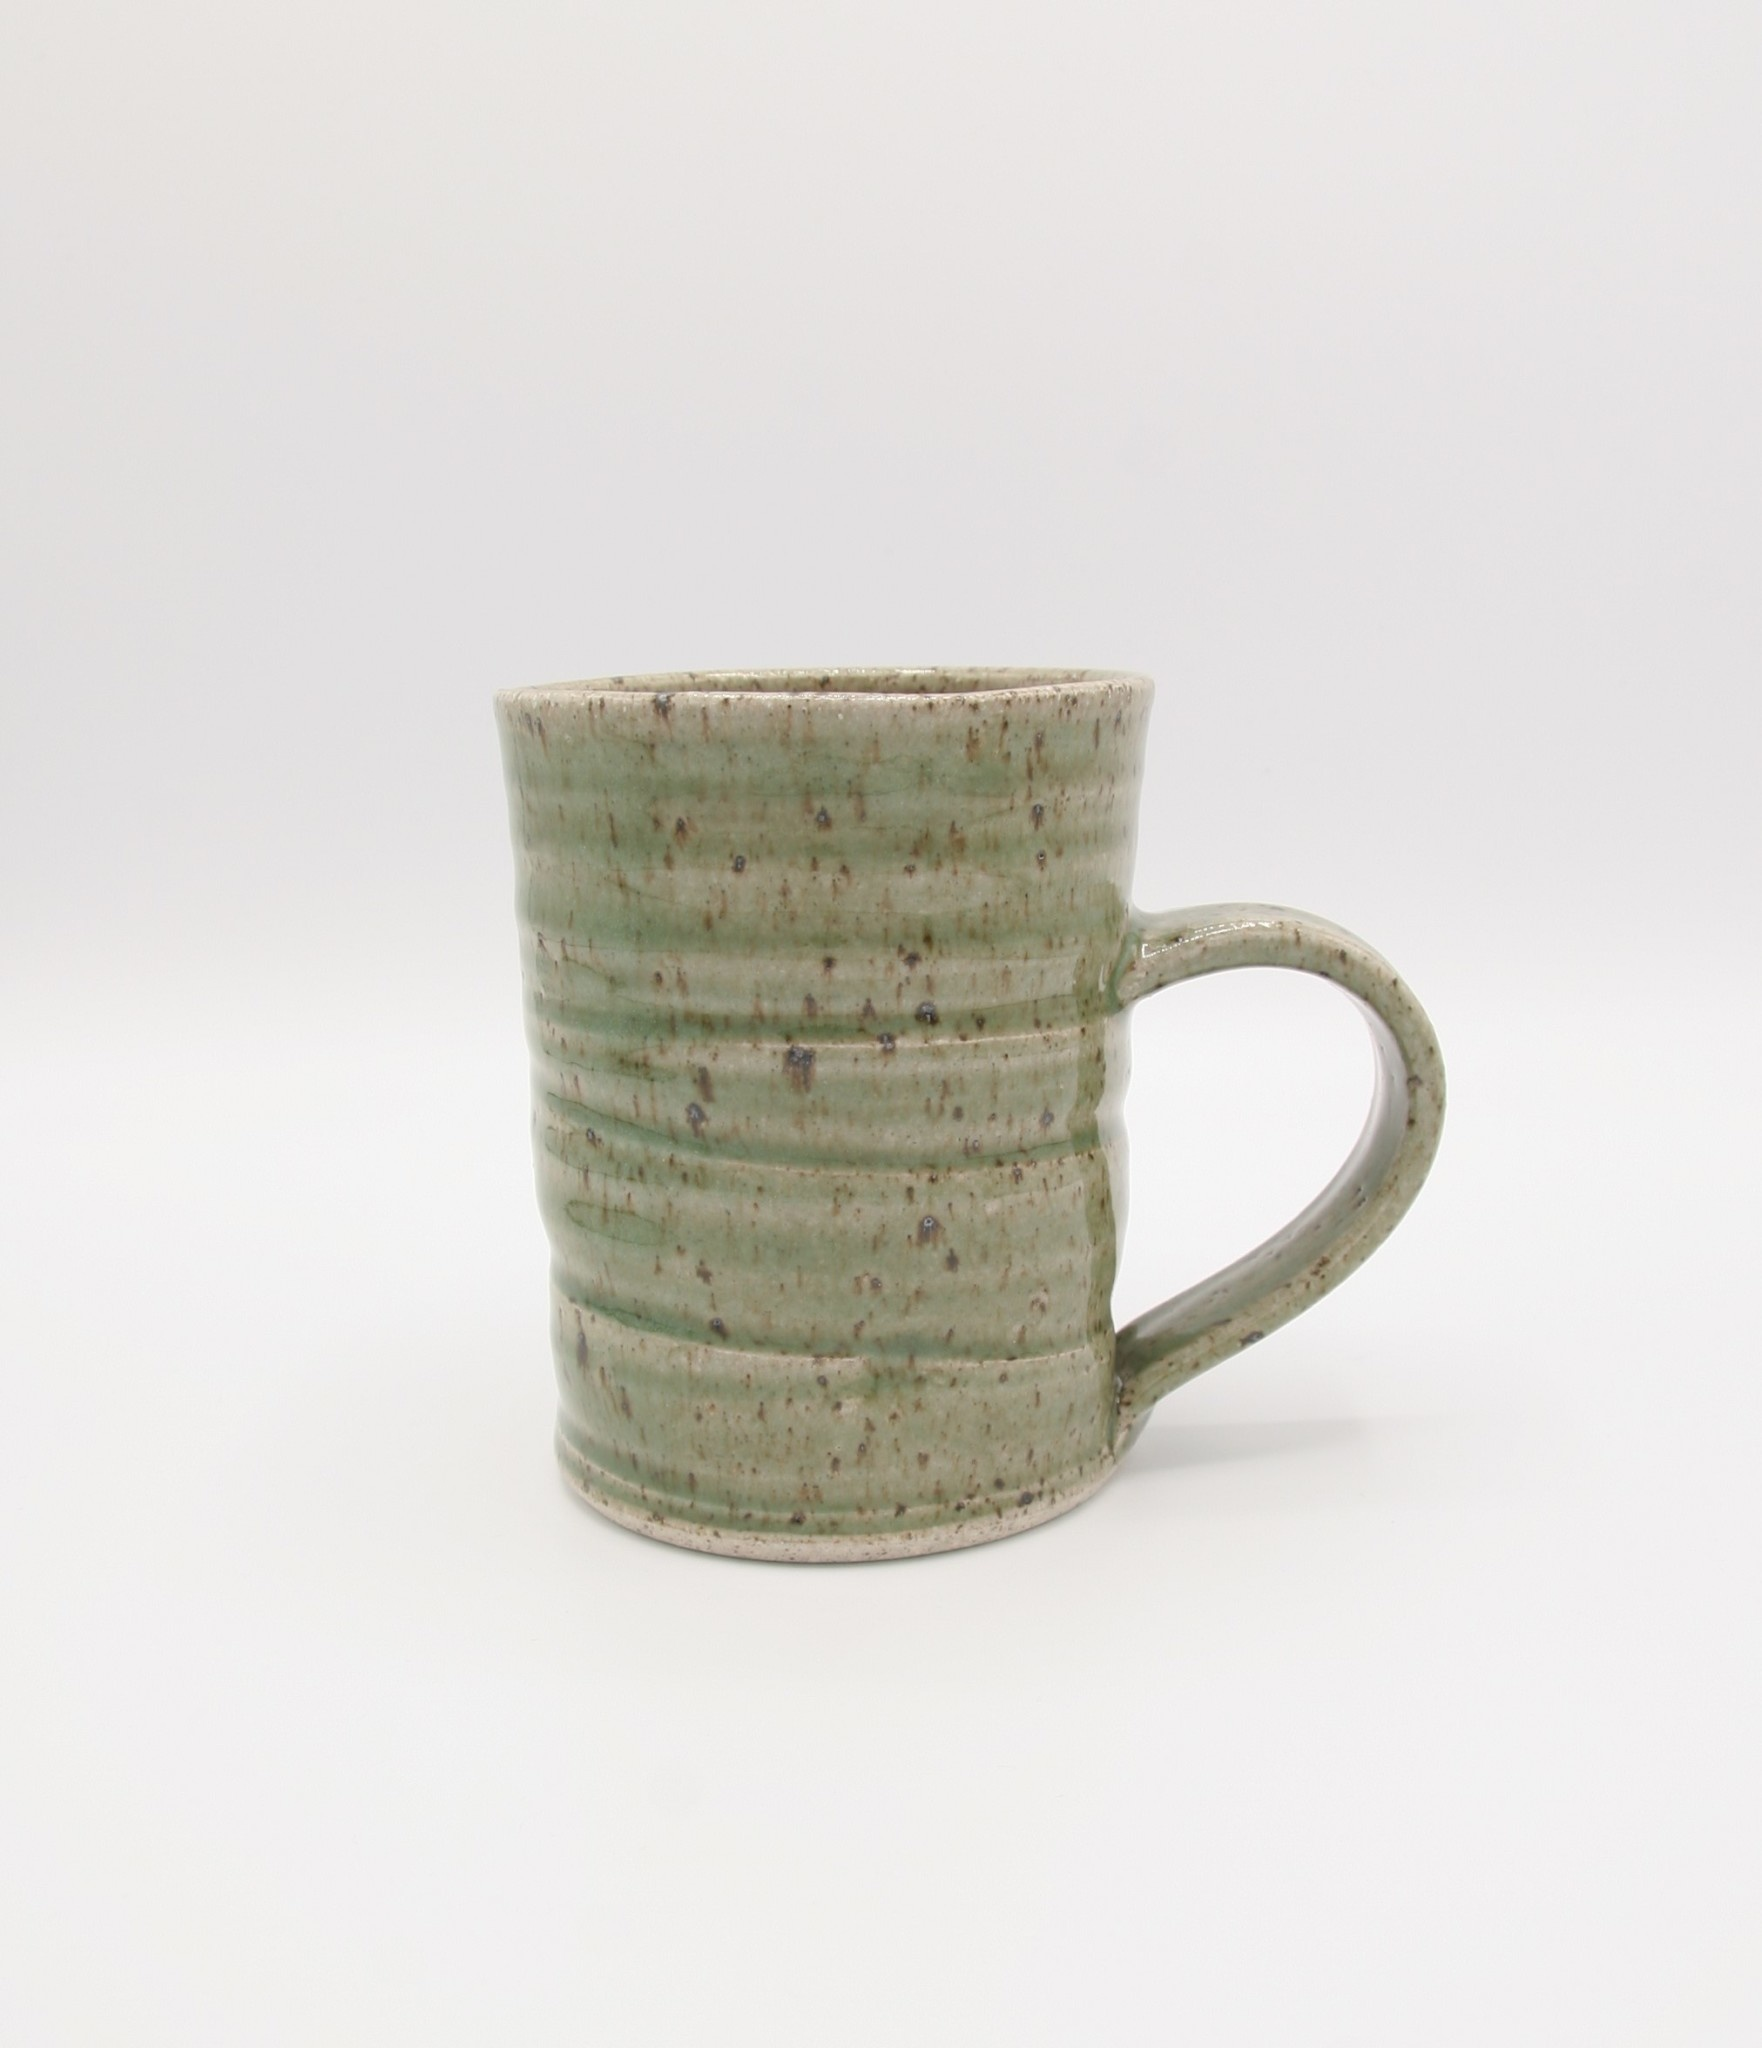 Dave Dobie Mug - Gas Fired - Light Green